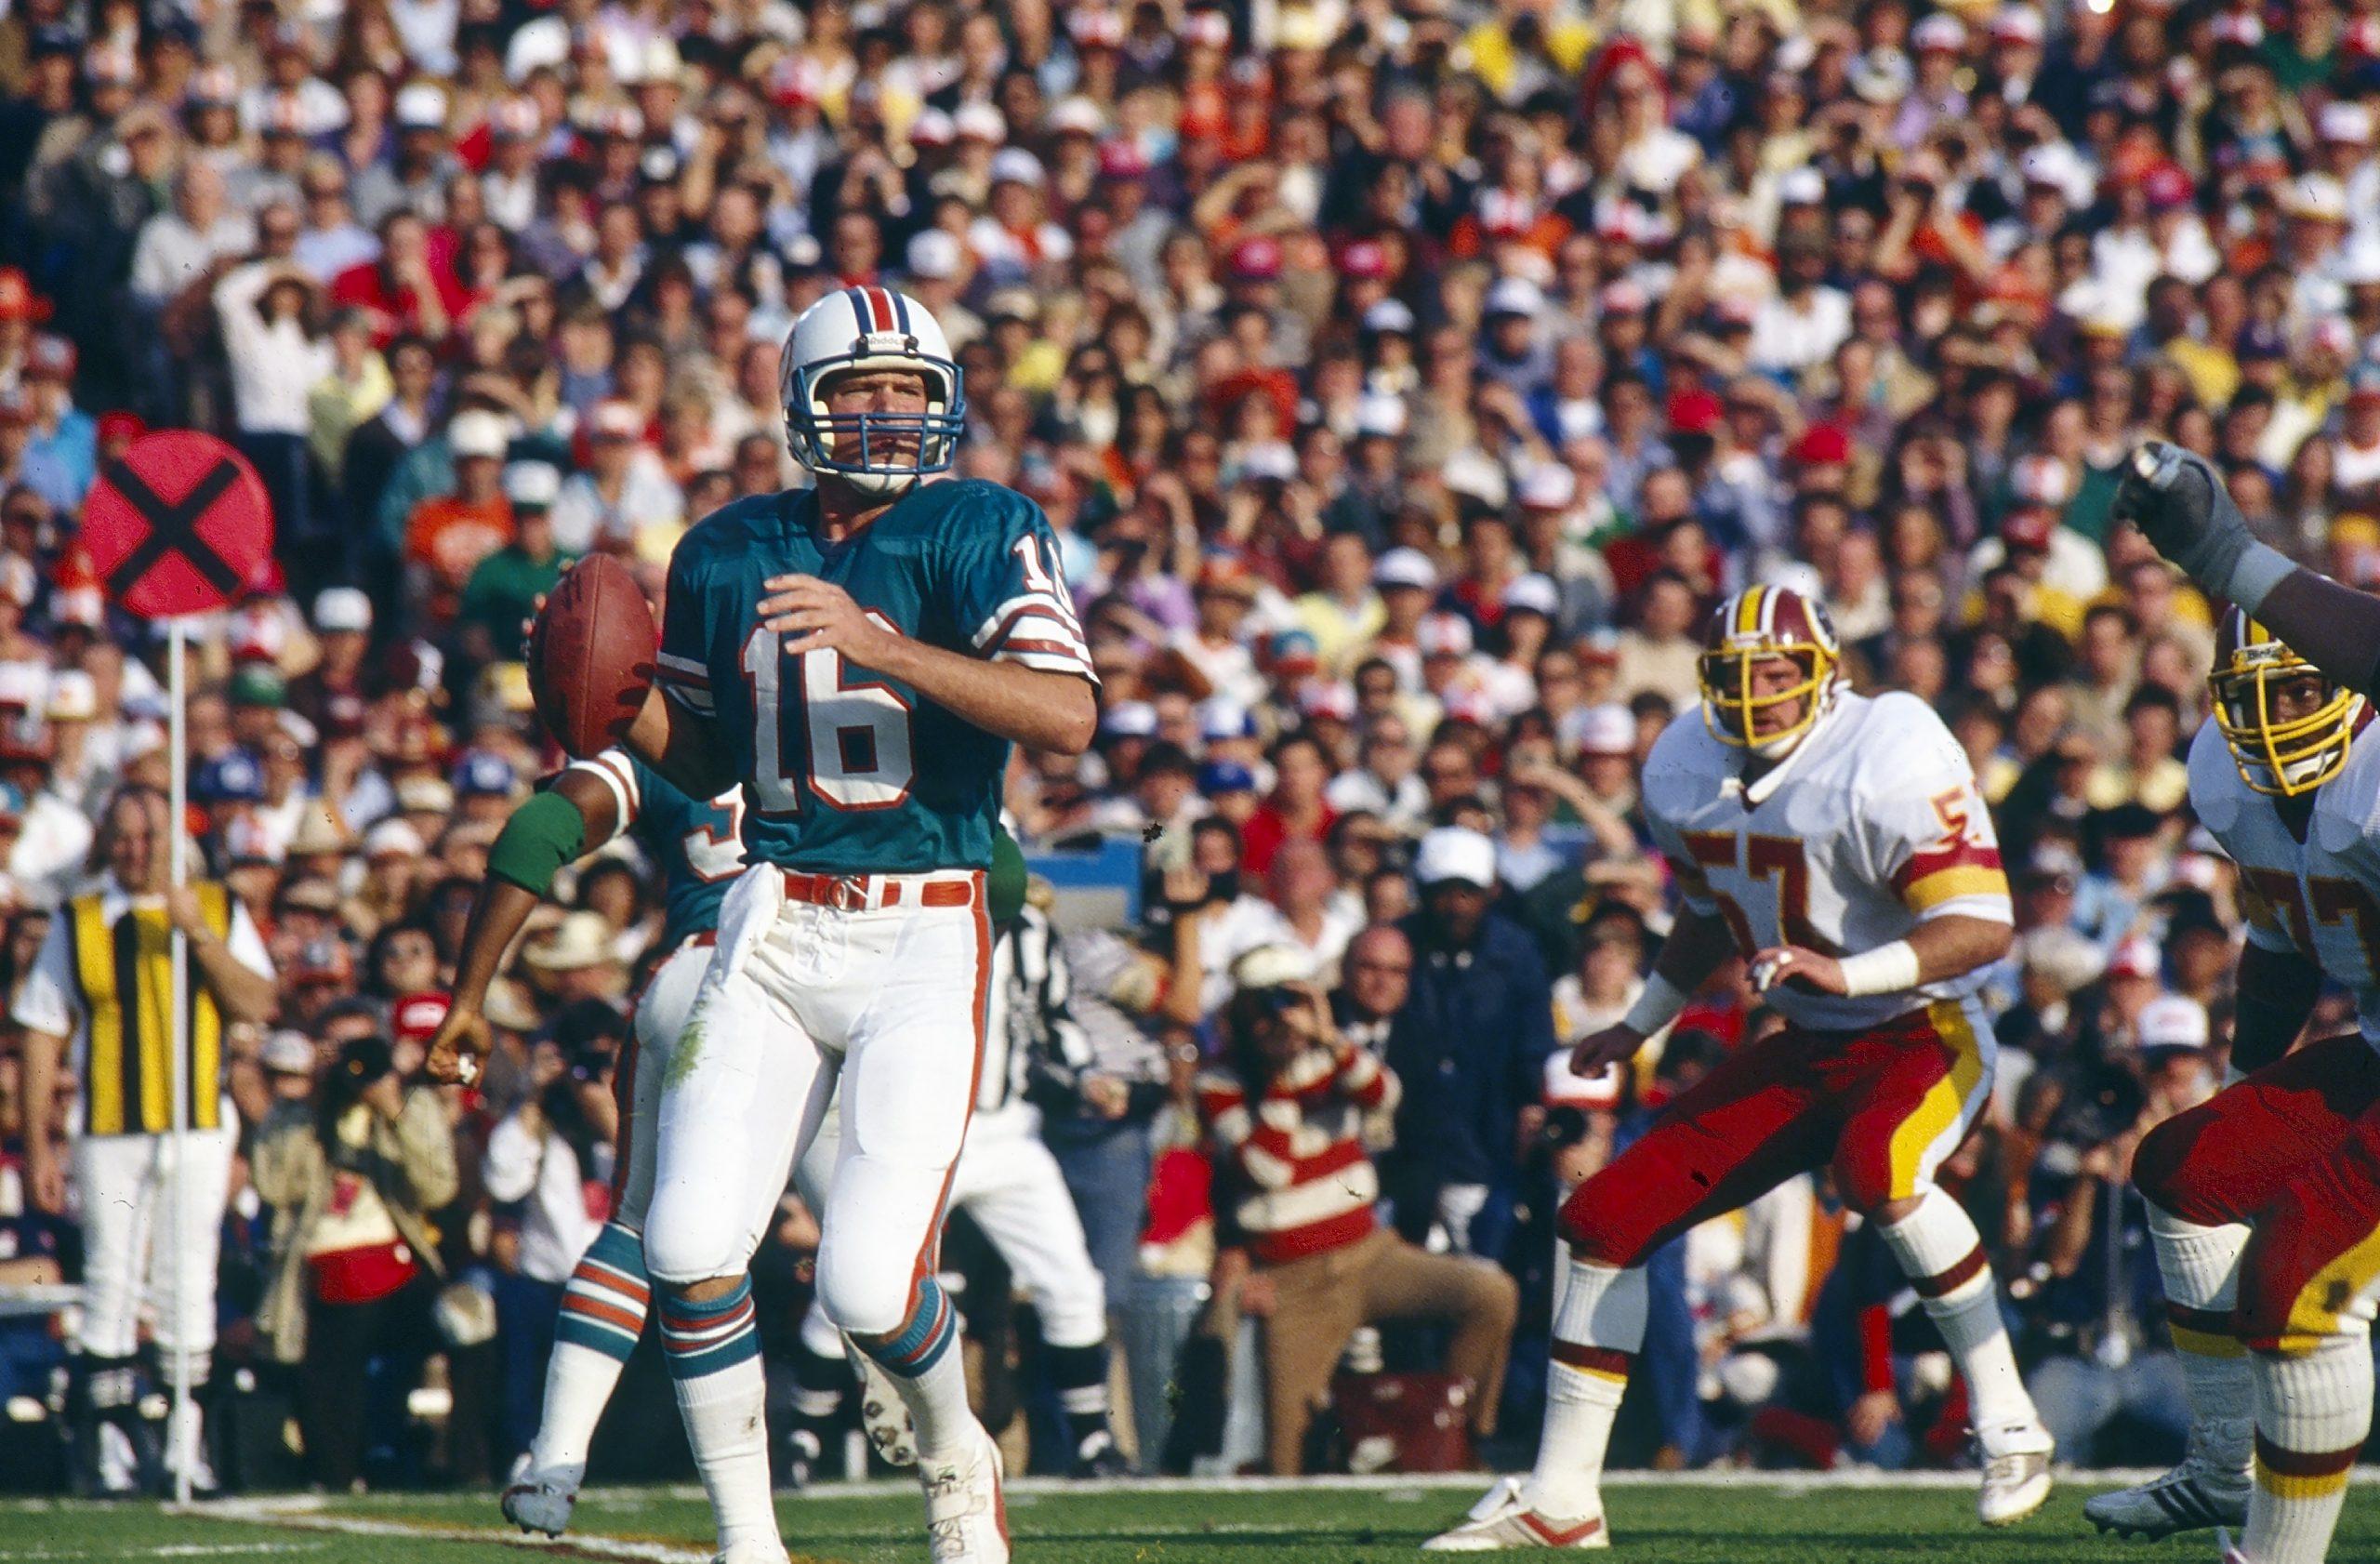 Dan Marino, Miami Dolphins Vs. Washington Redskins At 1983 regarding Miami Super Bowl Marino